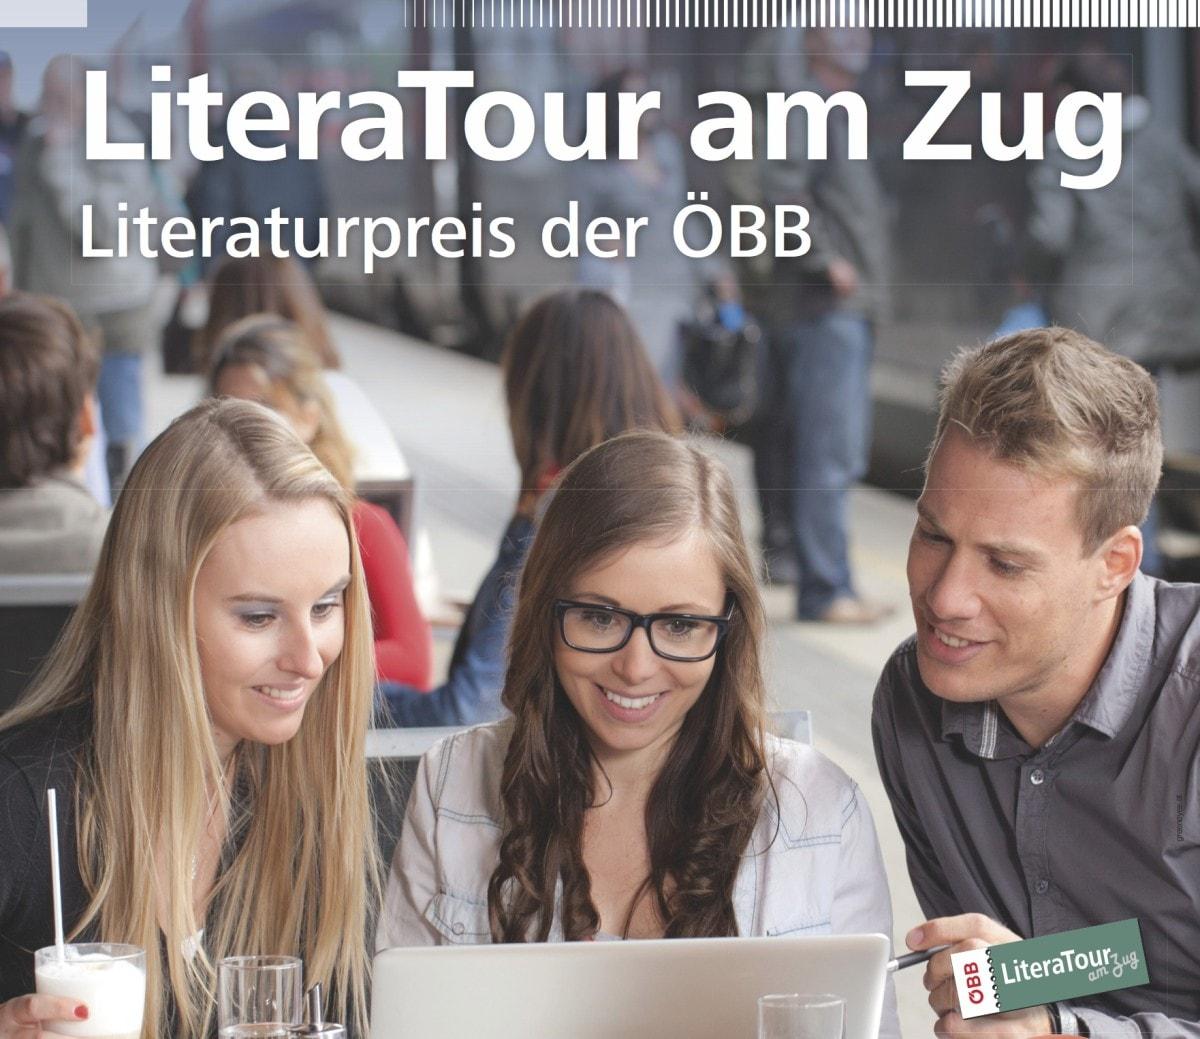 LiteraTour